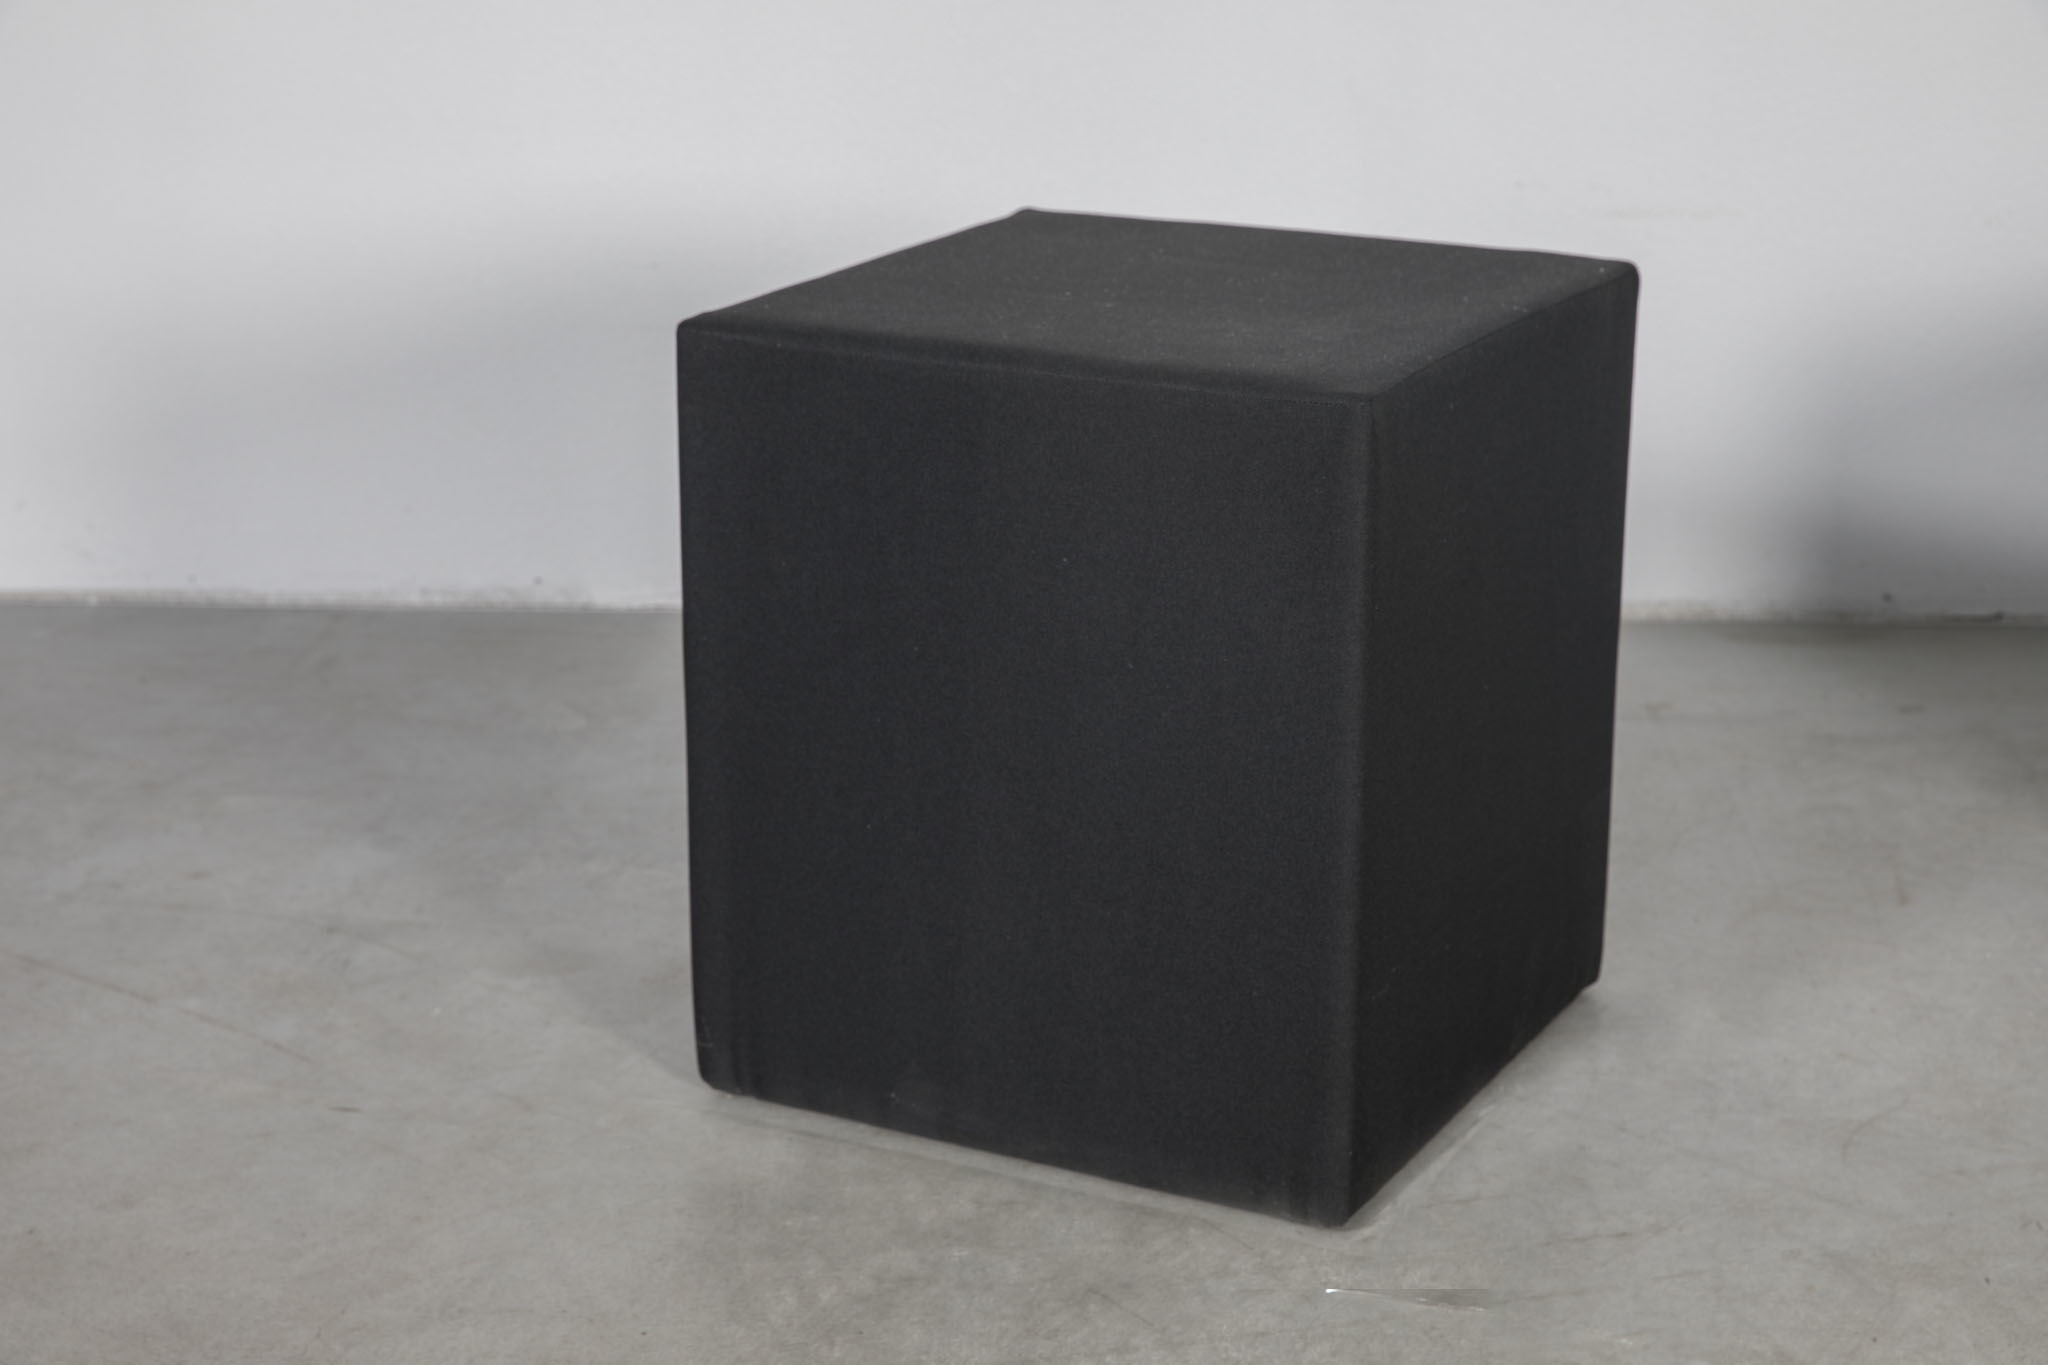 Elektrisch Boxspring Black Friday Delux